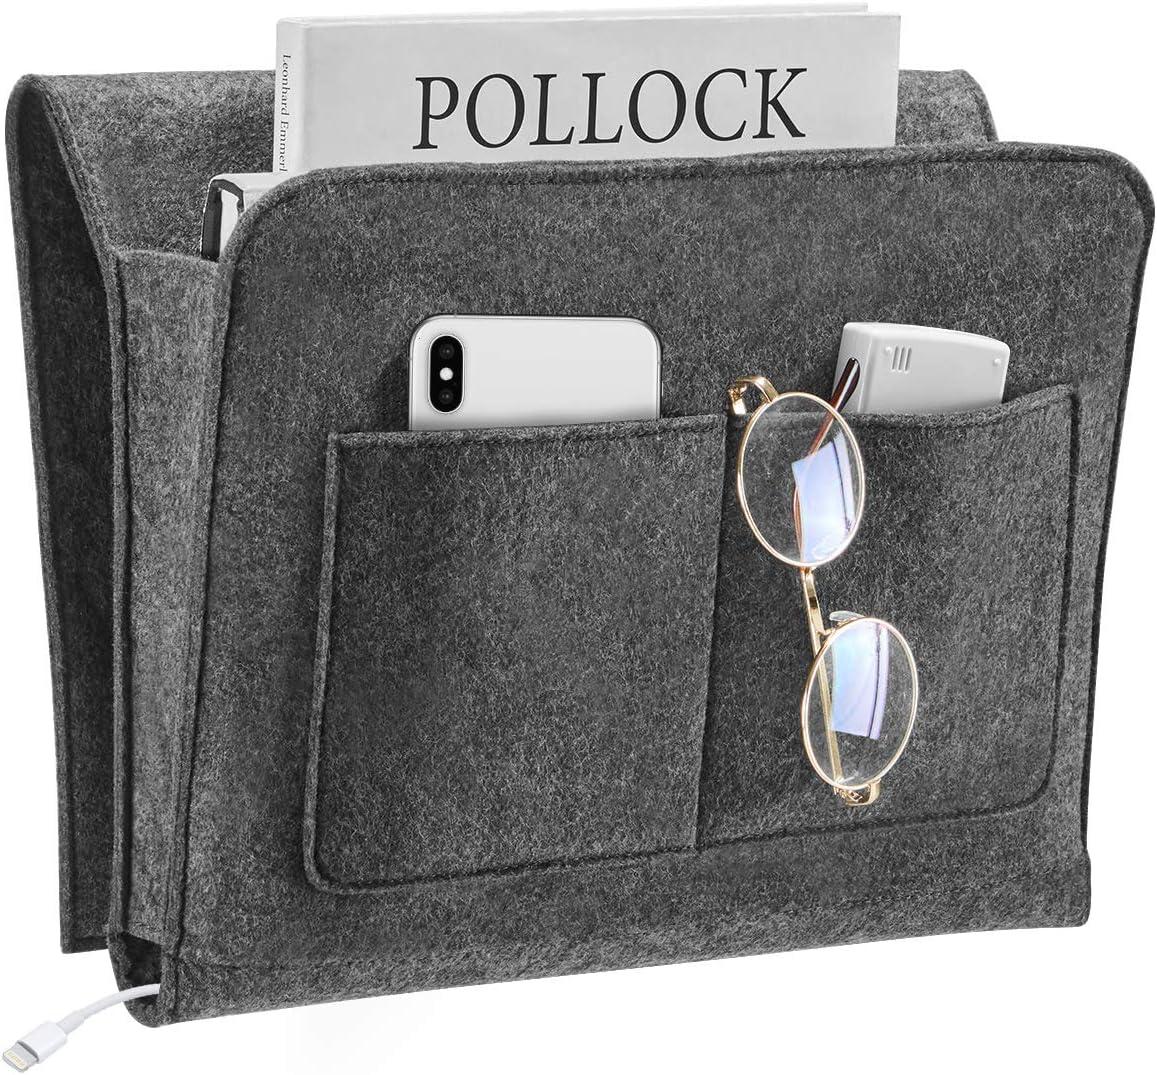 YOUDENOVA Bedside Caddy, 5 Pockets Bed Hanging Storage Organizer Holder for Remote Phone, Magazine, iPad, Snack, College Dorm Bunk Remotes Holder